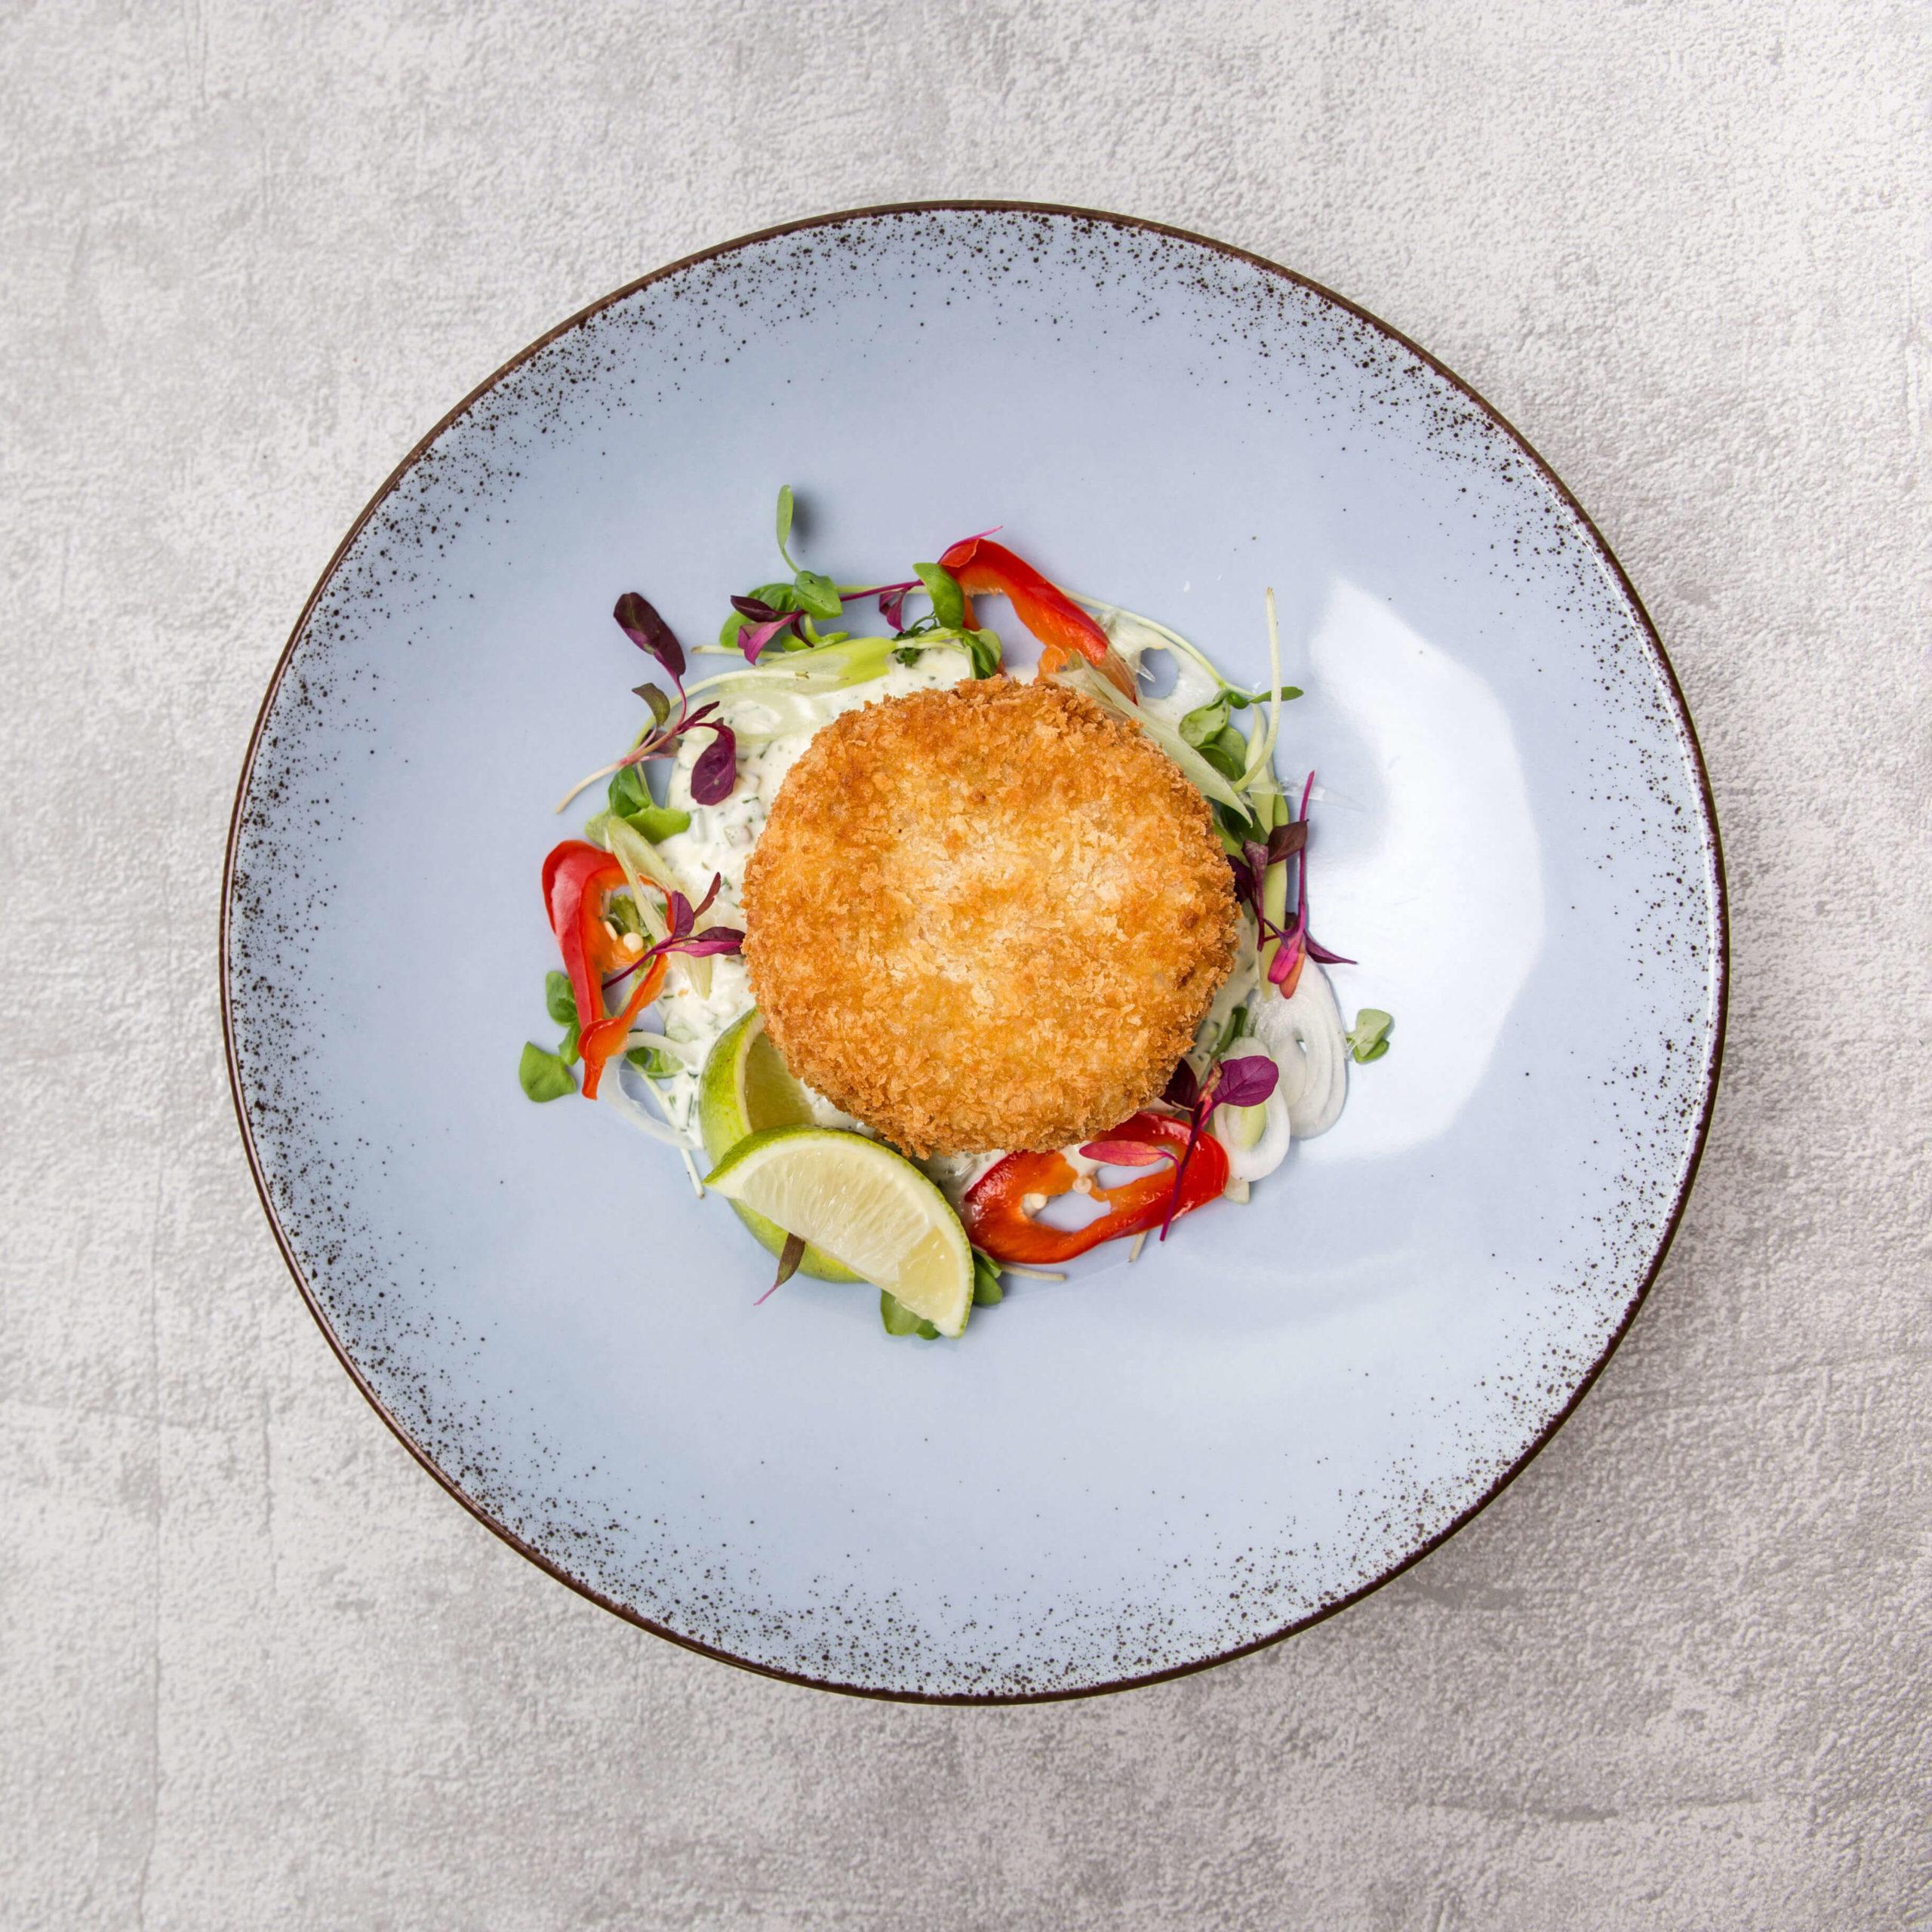 salmon-and-sweet-potato-fishcake